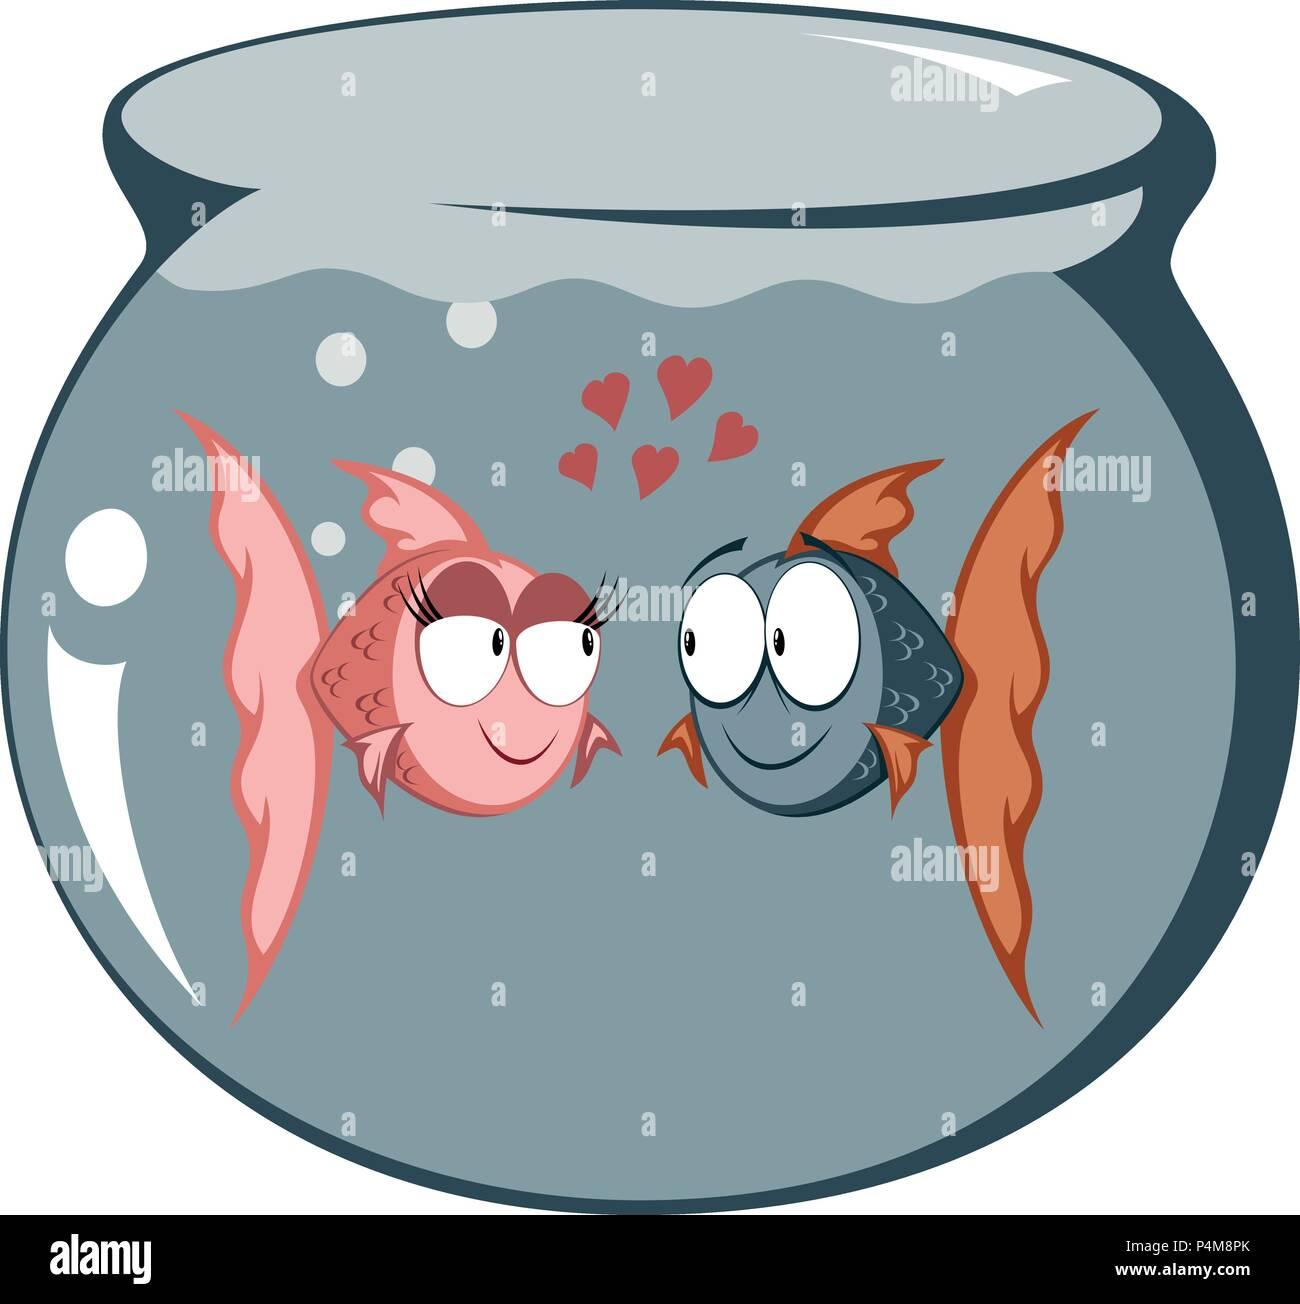 Cool Cartoon Goldfisch Paar In Liebe In A Fish Tank Vektor